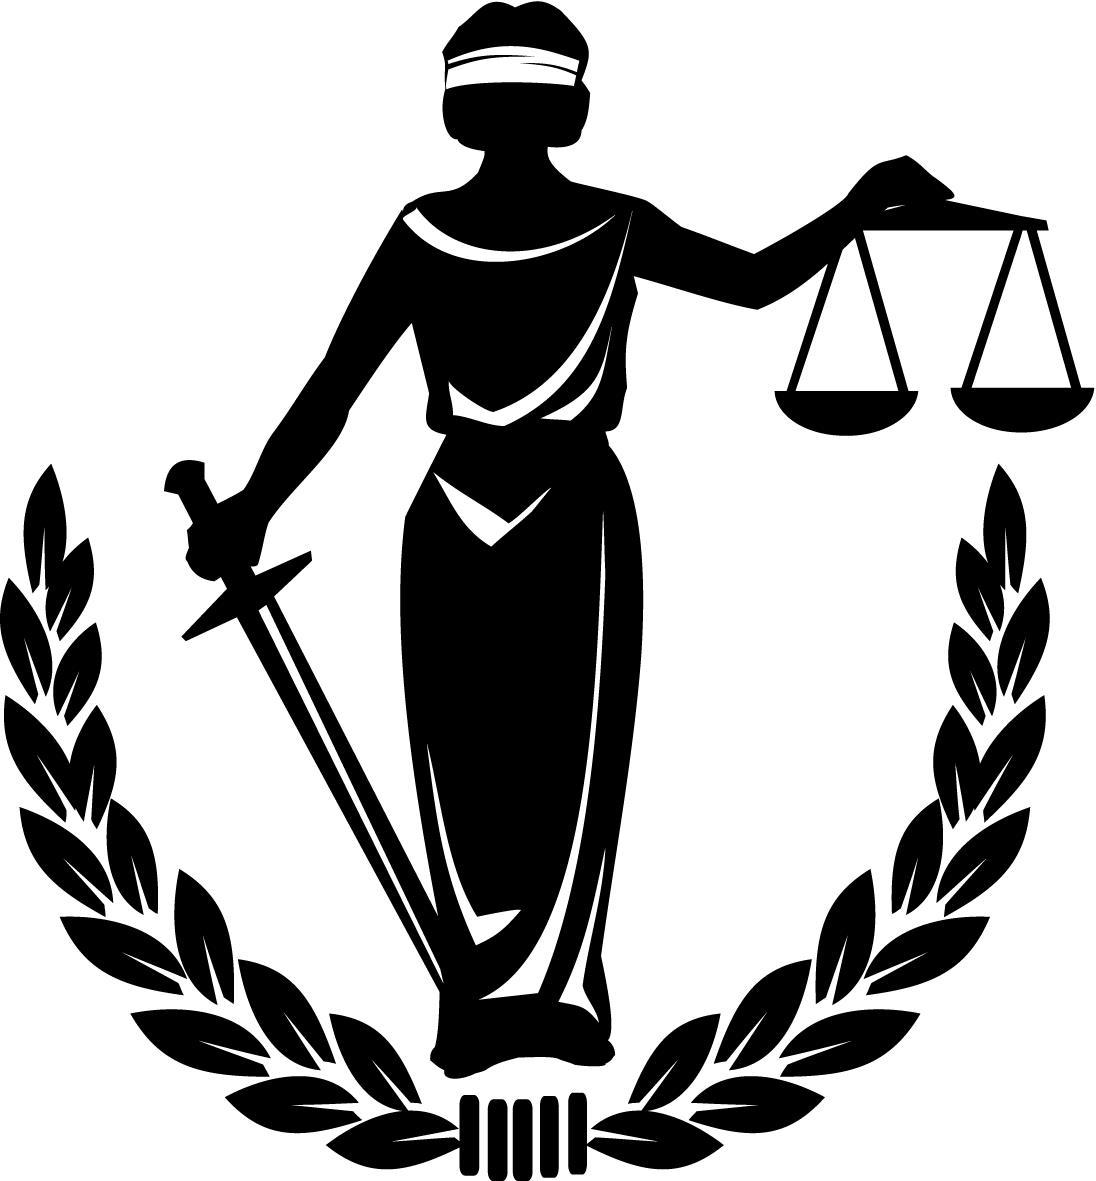 The Law Office of Bruce J. Guttman